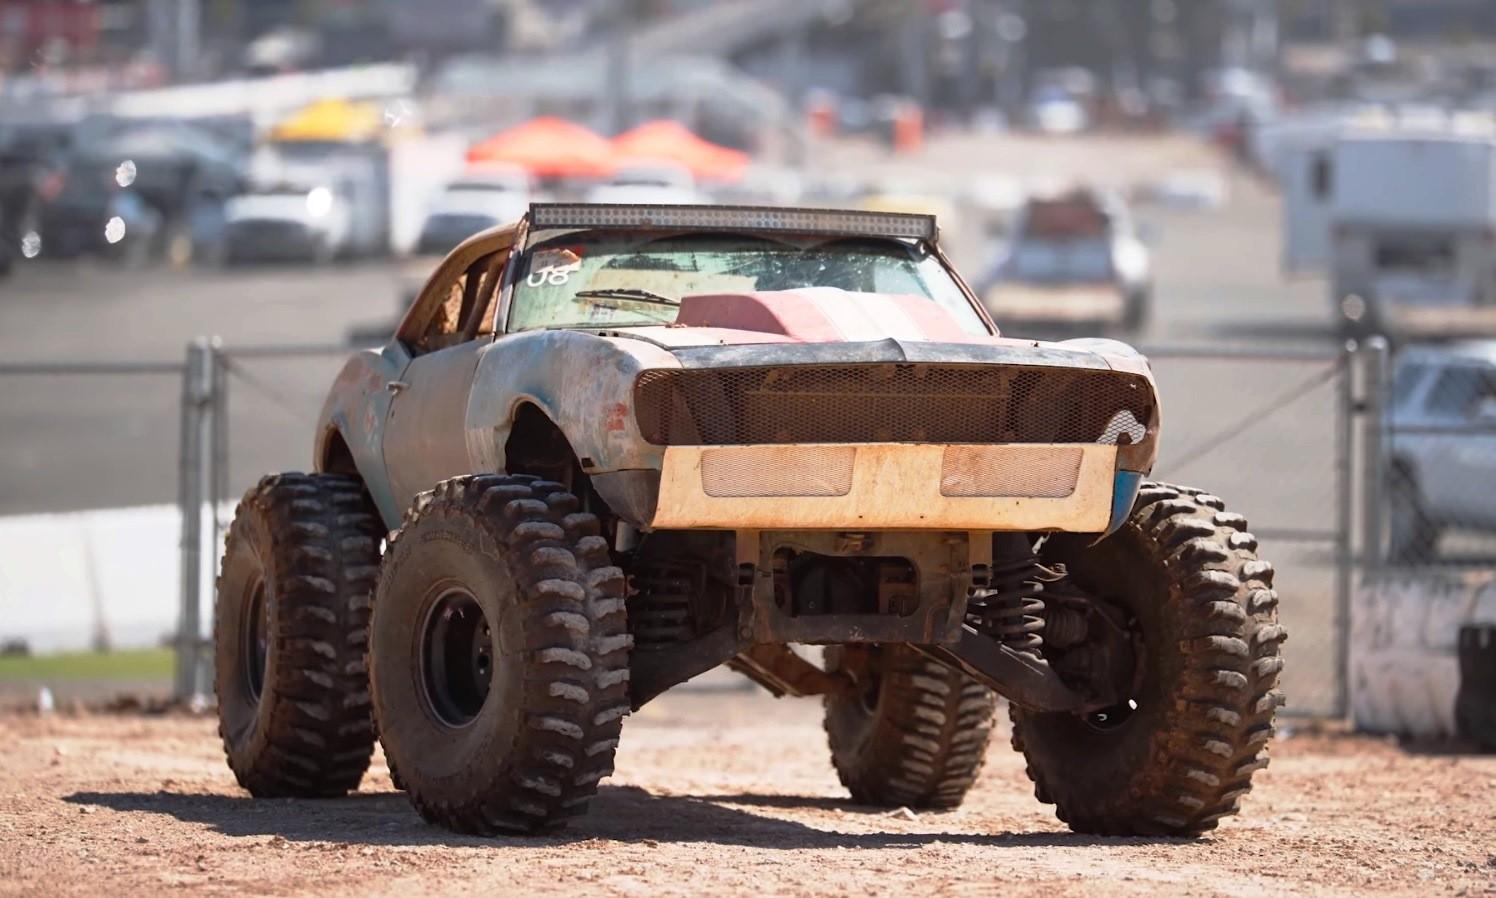 4x4 Chev Camaro front